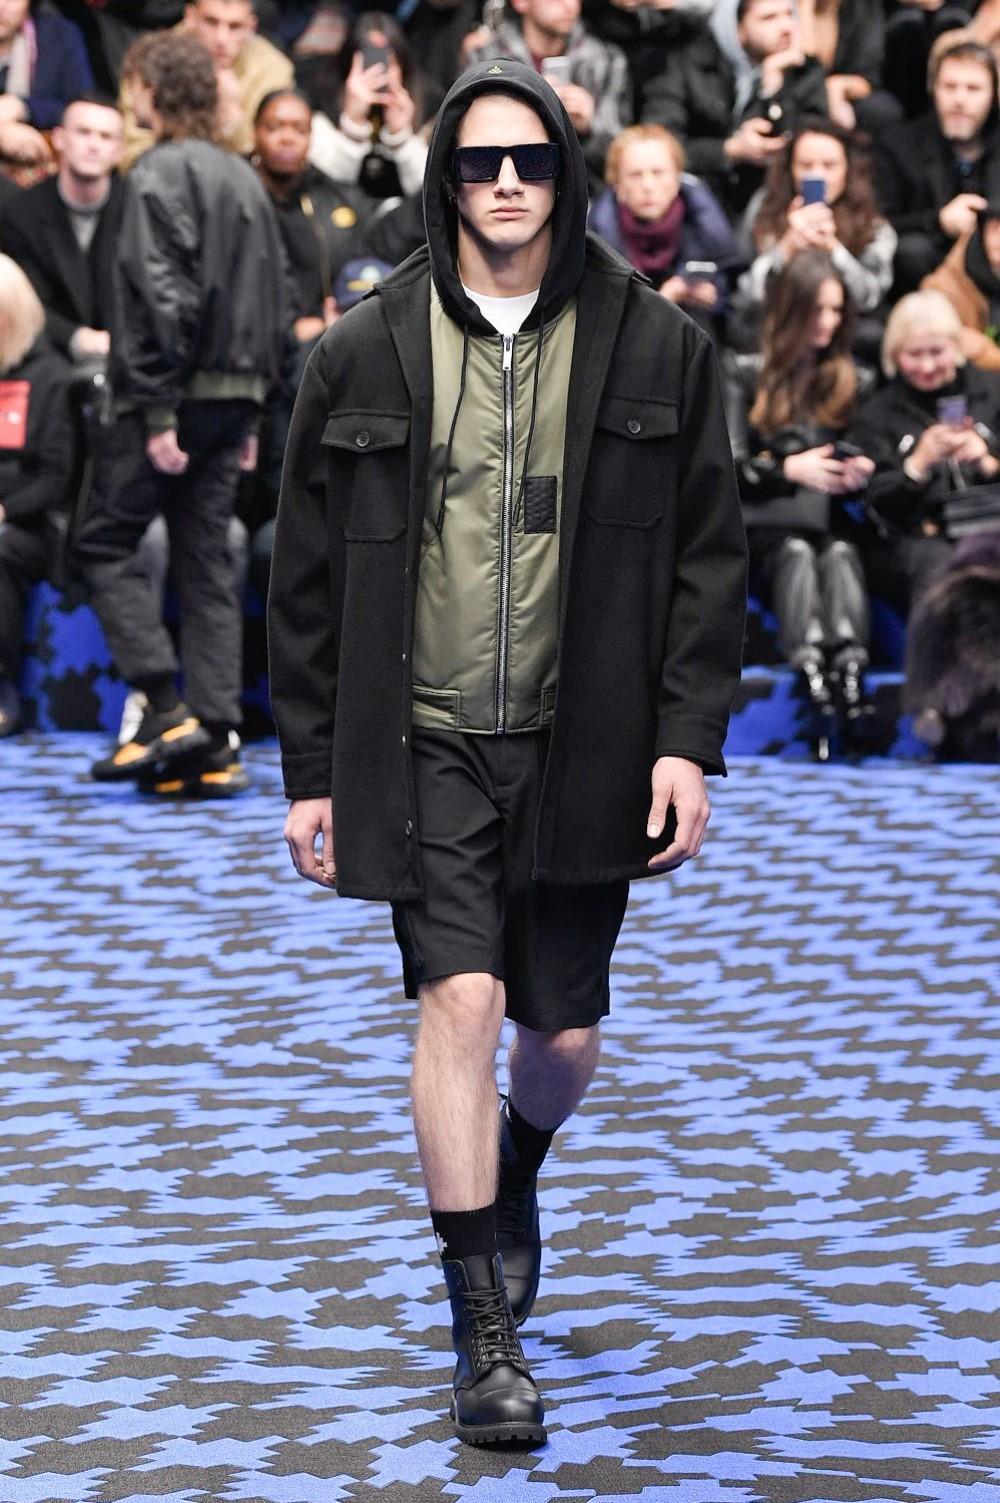 Marcelo Burlon County of Milan - Automne-Hiver 2020-2021 - Milan Fashion Week